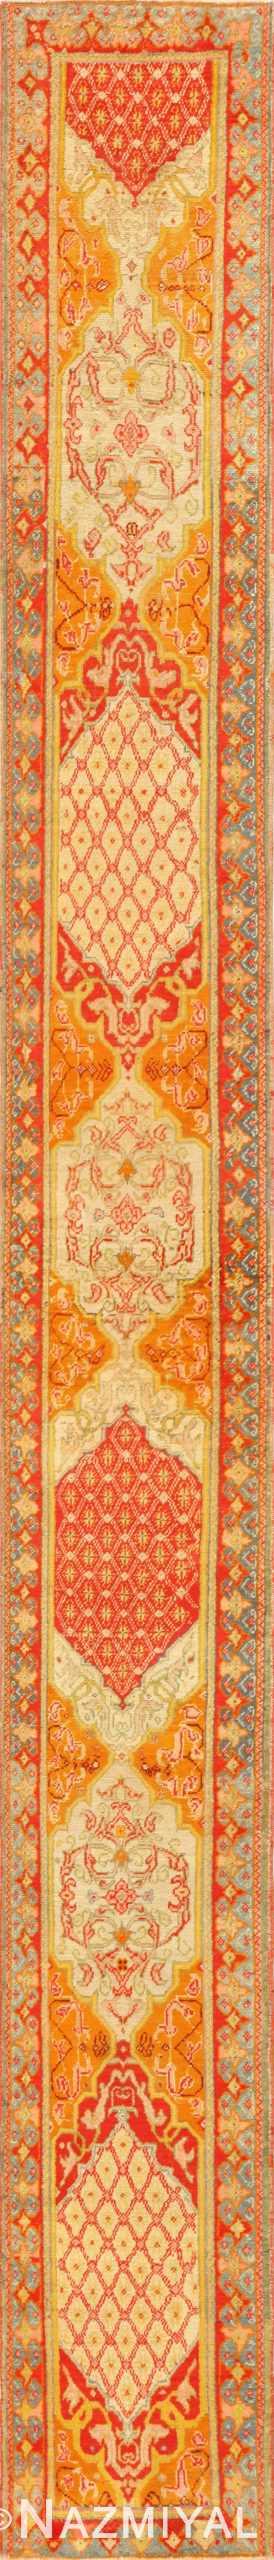 Antique Arts and Crafts Turkish Oushak Runner Rug 48675 Nazmiyal